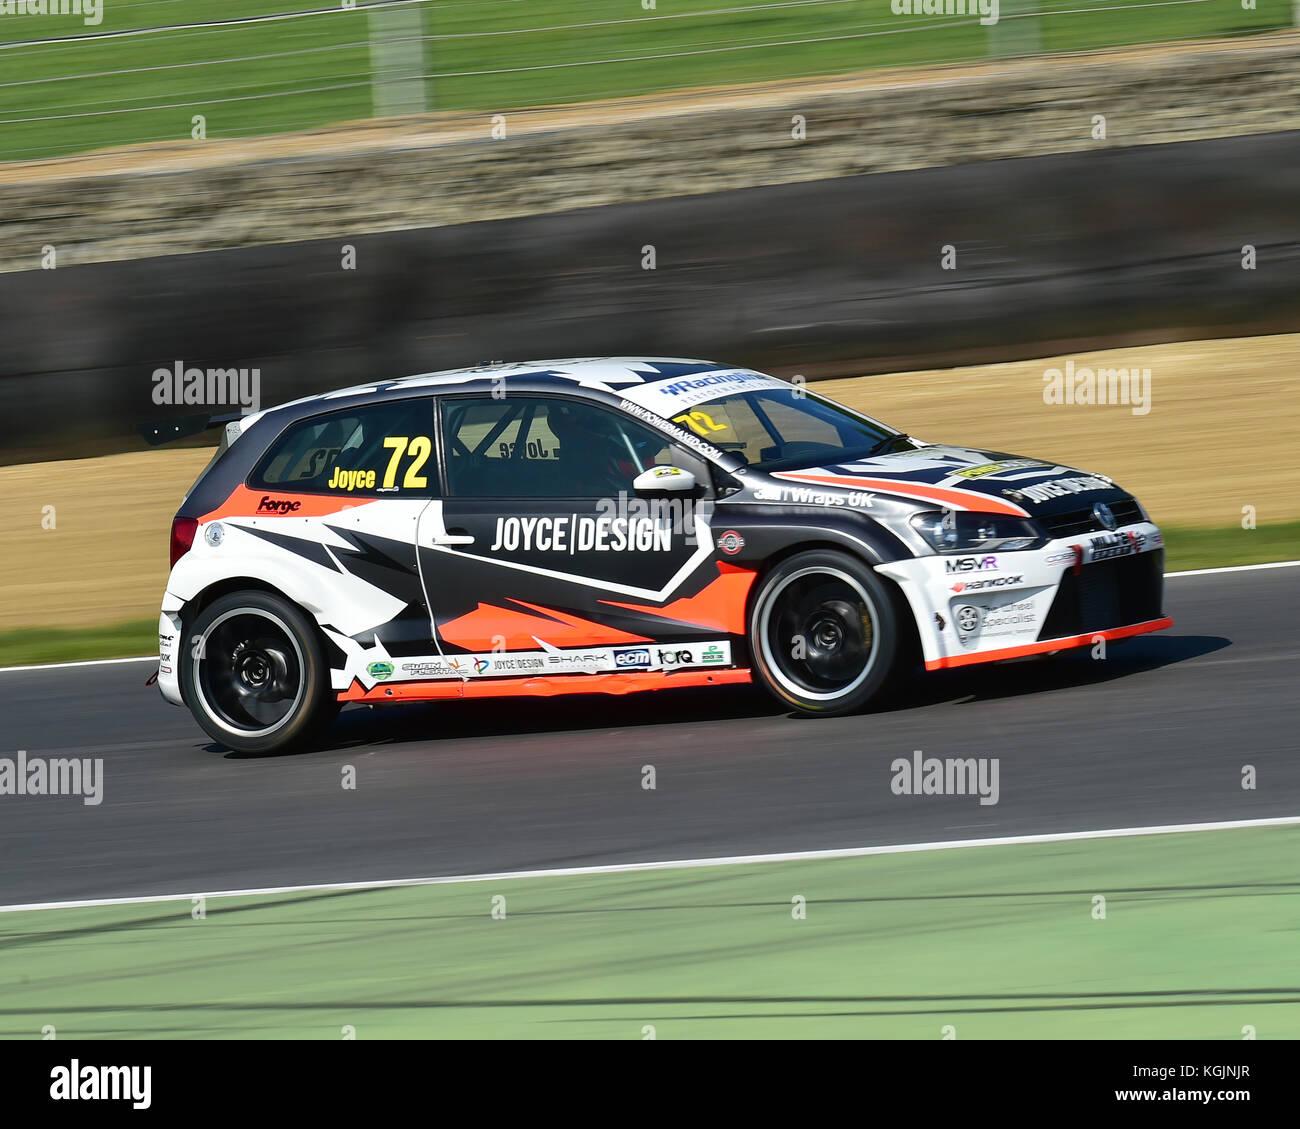 Russell Joyce Vw Polo Volkswagen Racing Cup Vw Deutsche Fest